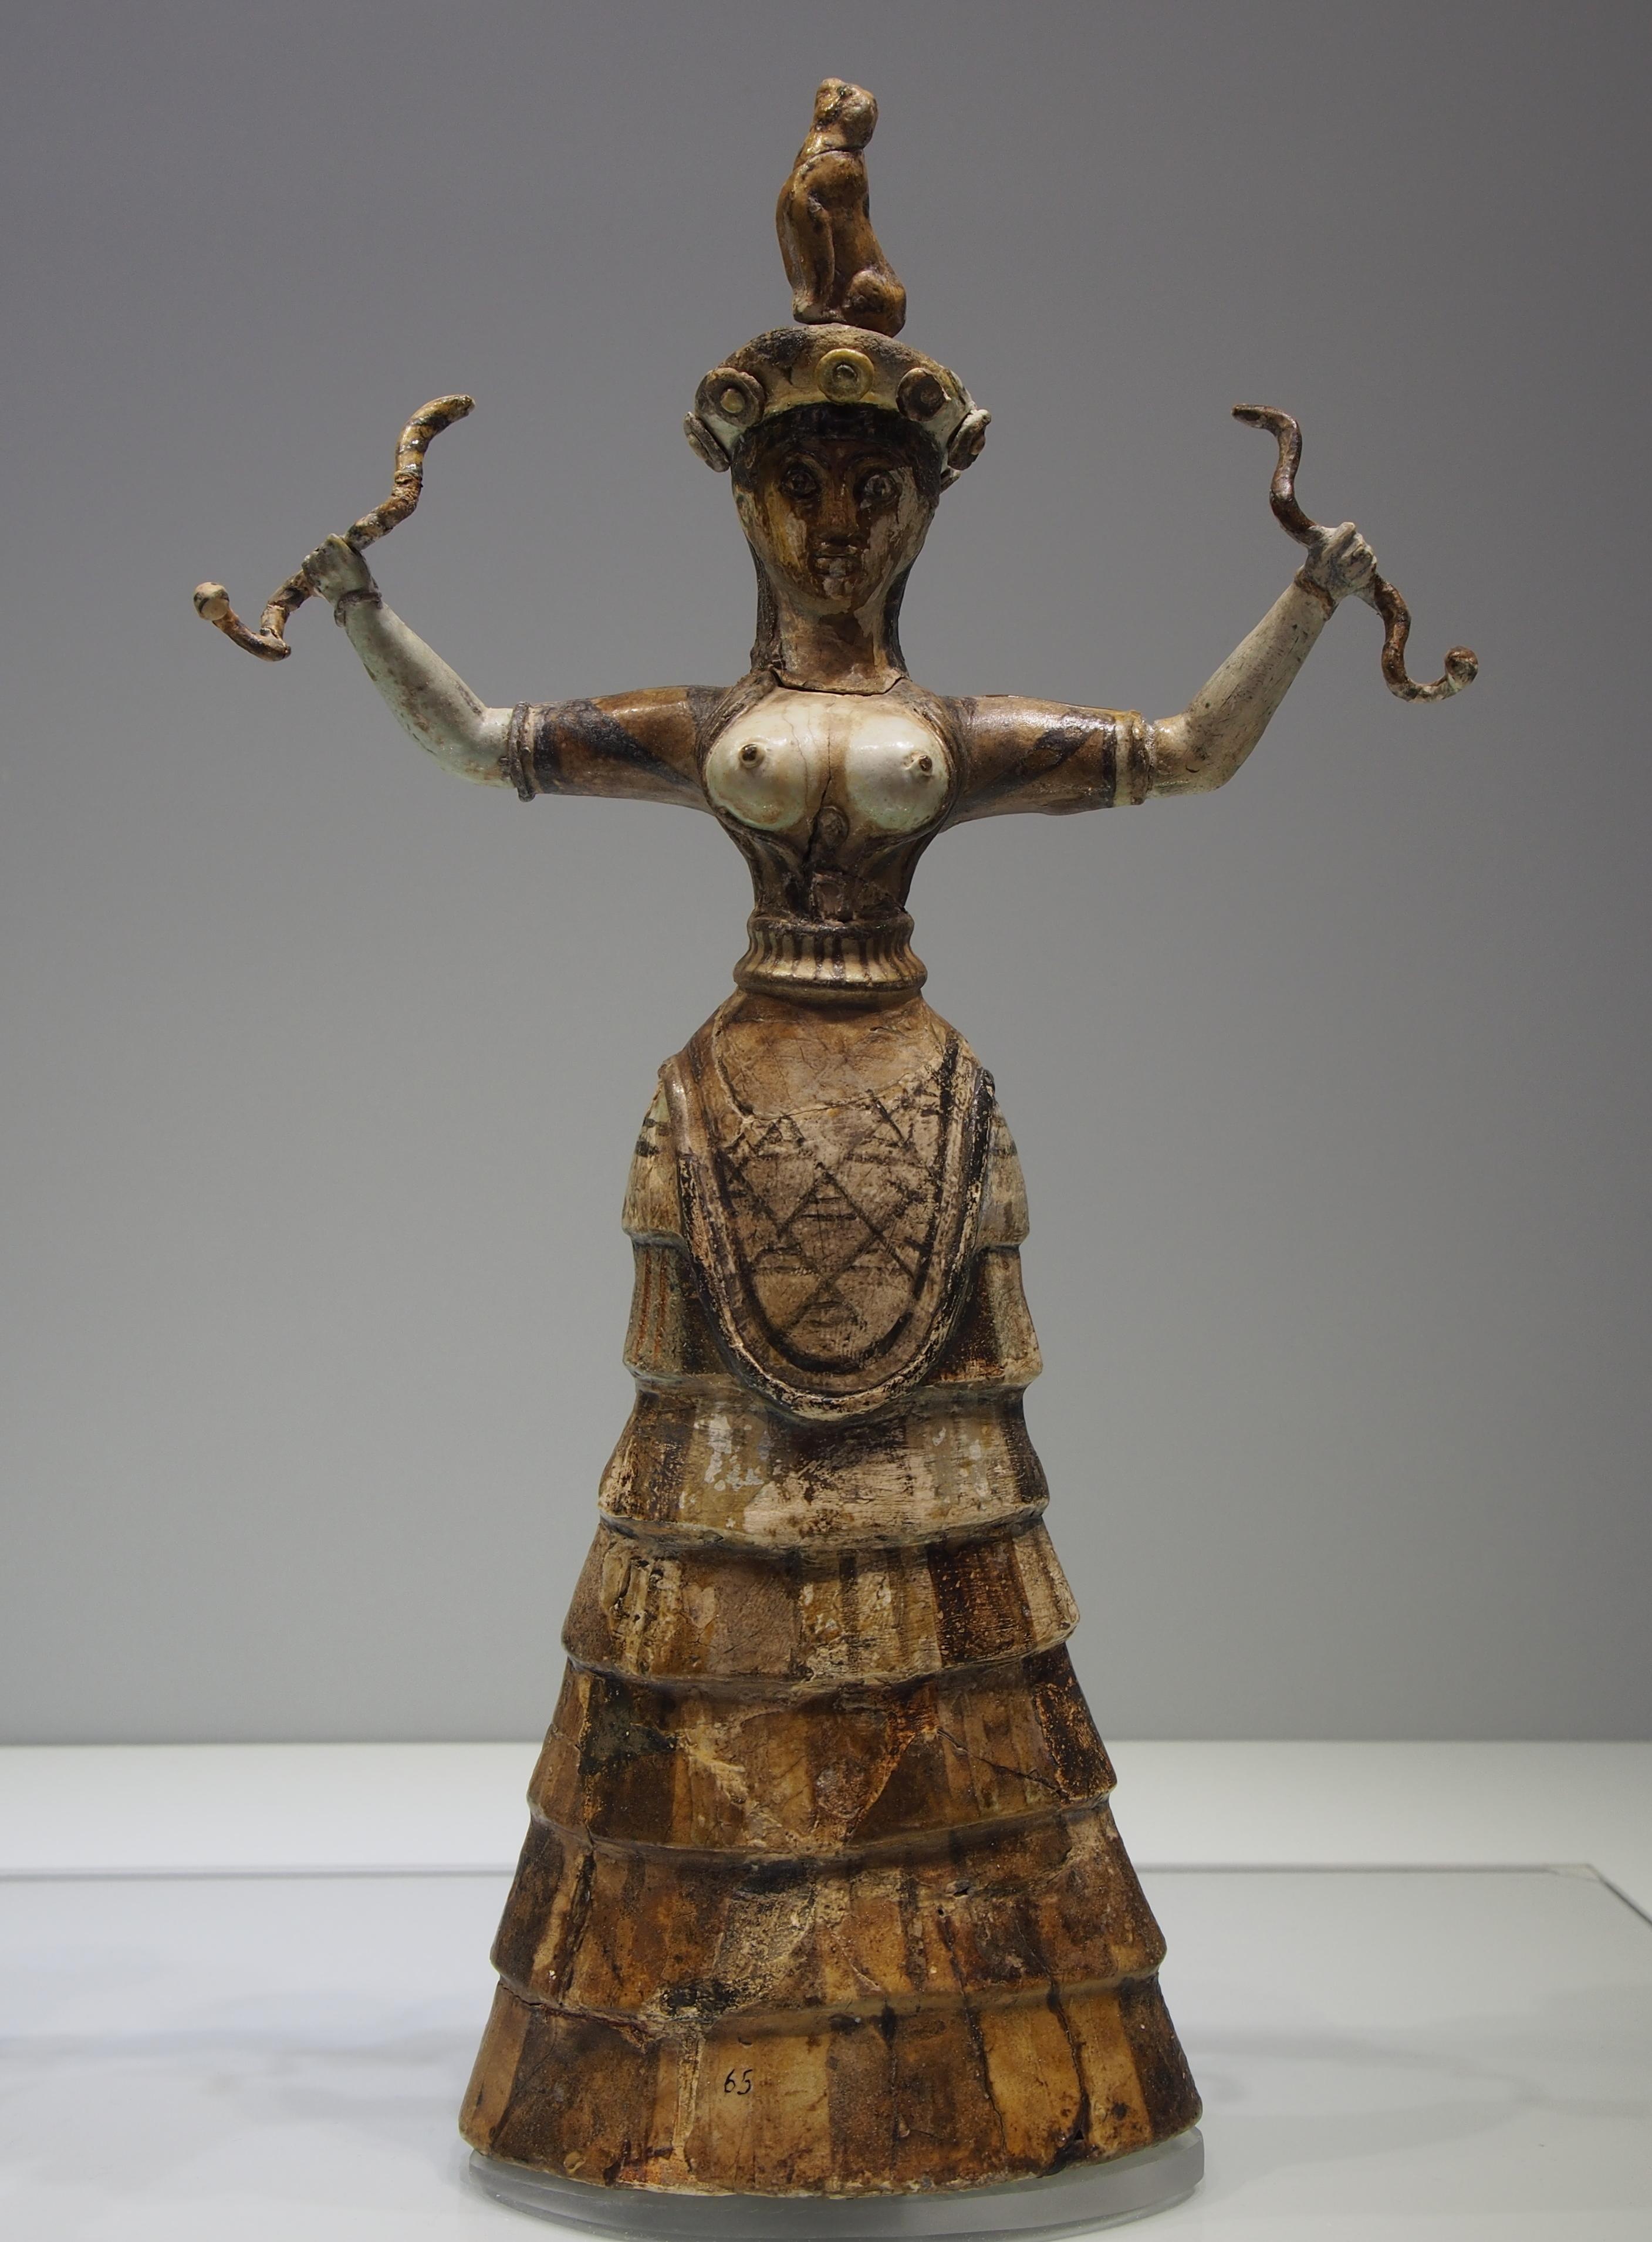 Minoan snake goddess figurines - Wikipedia